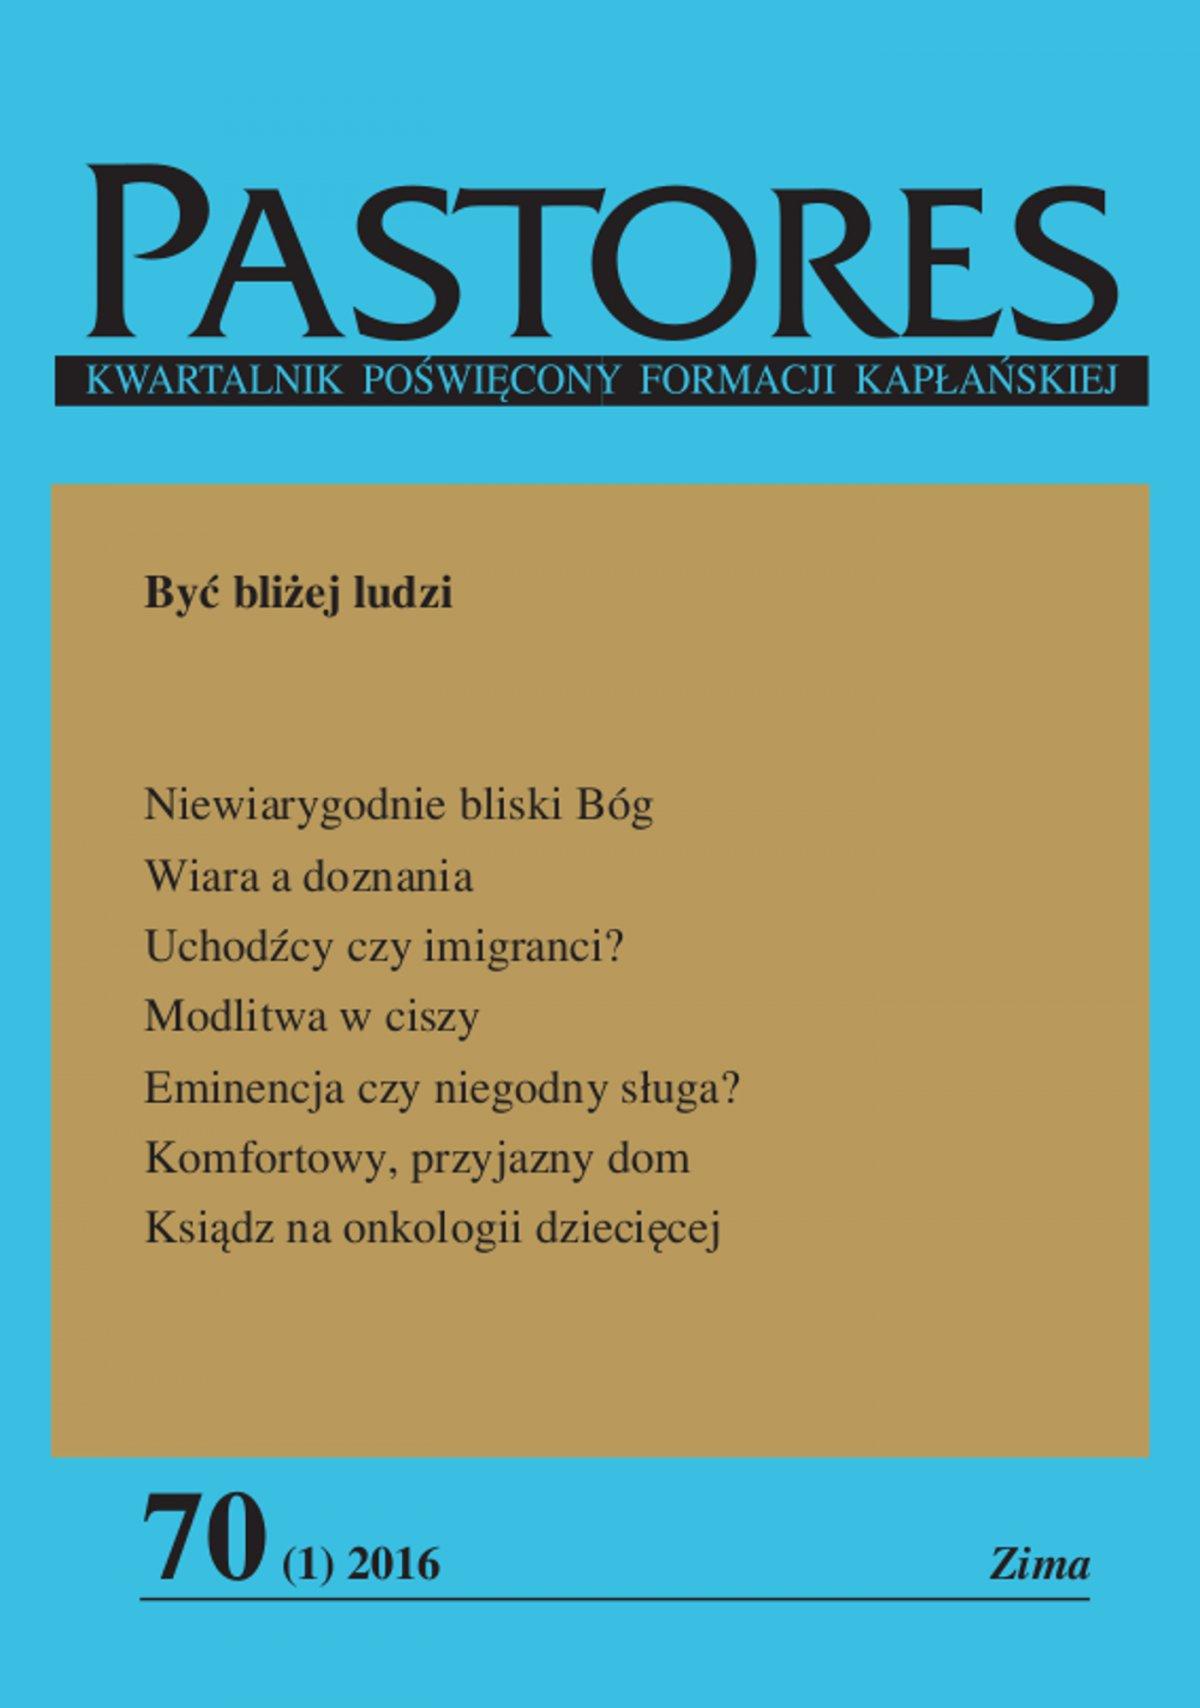 Pastores 70 (1) 2016 - Ebook (Książka na Kindle) do pobrania w formacie MOBI